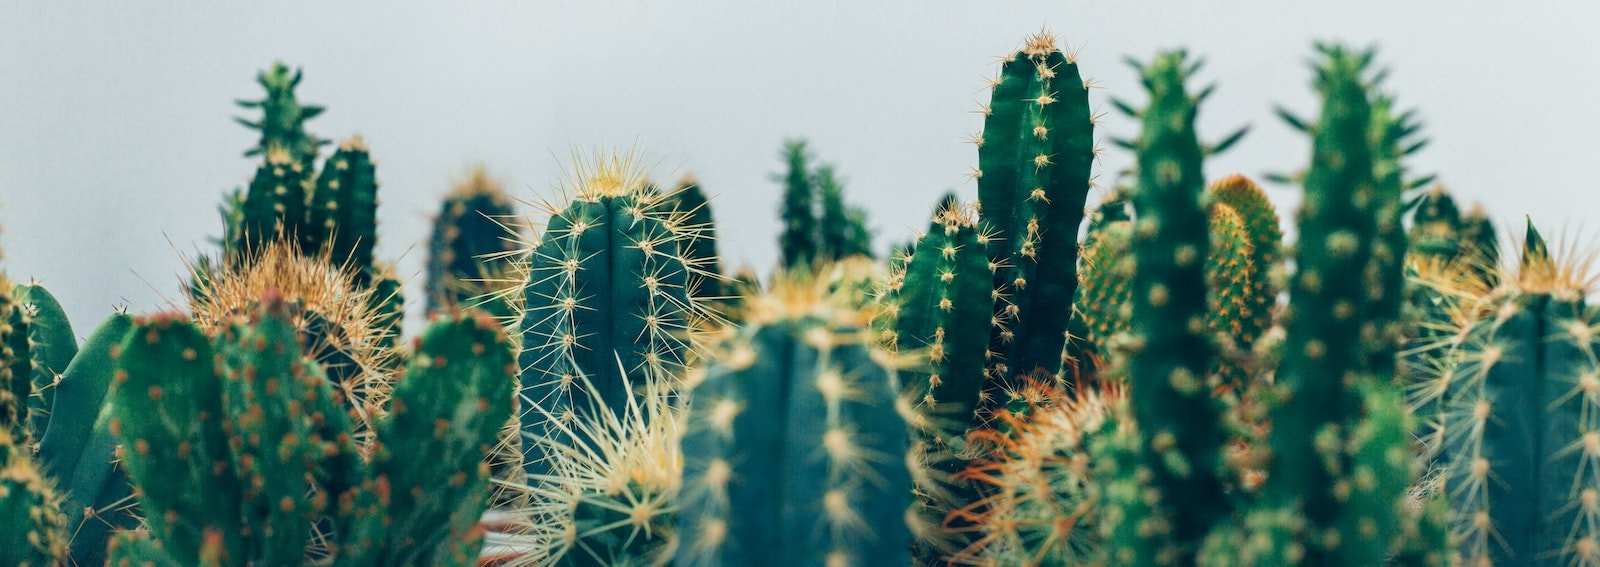 cactus foto hero grande